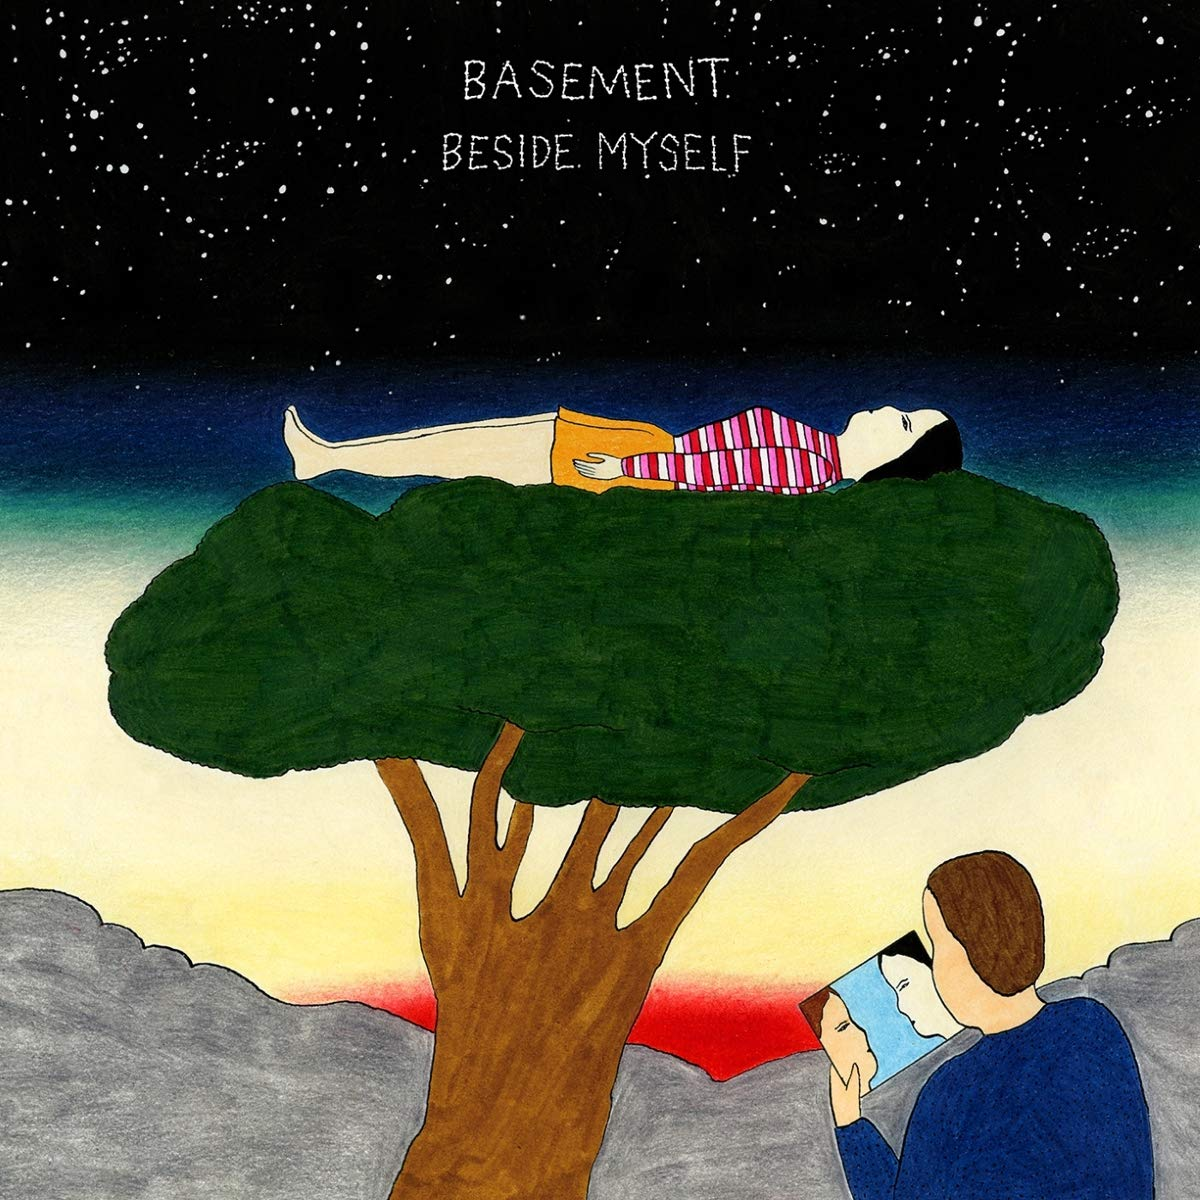 Vinilo : The Basement - Beside Myself (Red, Clear Vinyl, Digital Download Card)